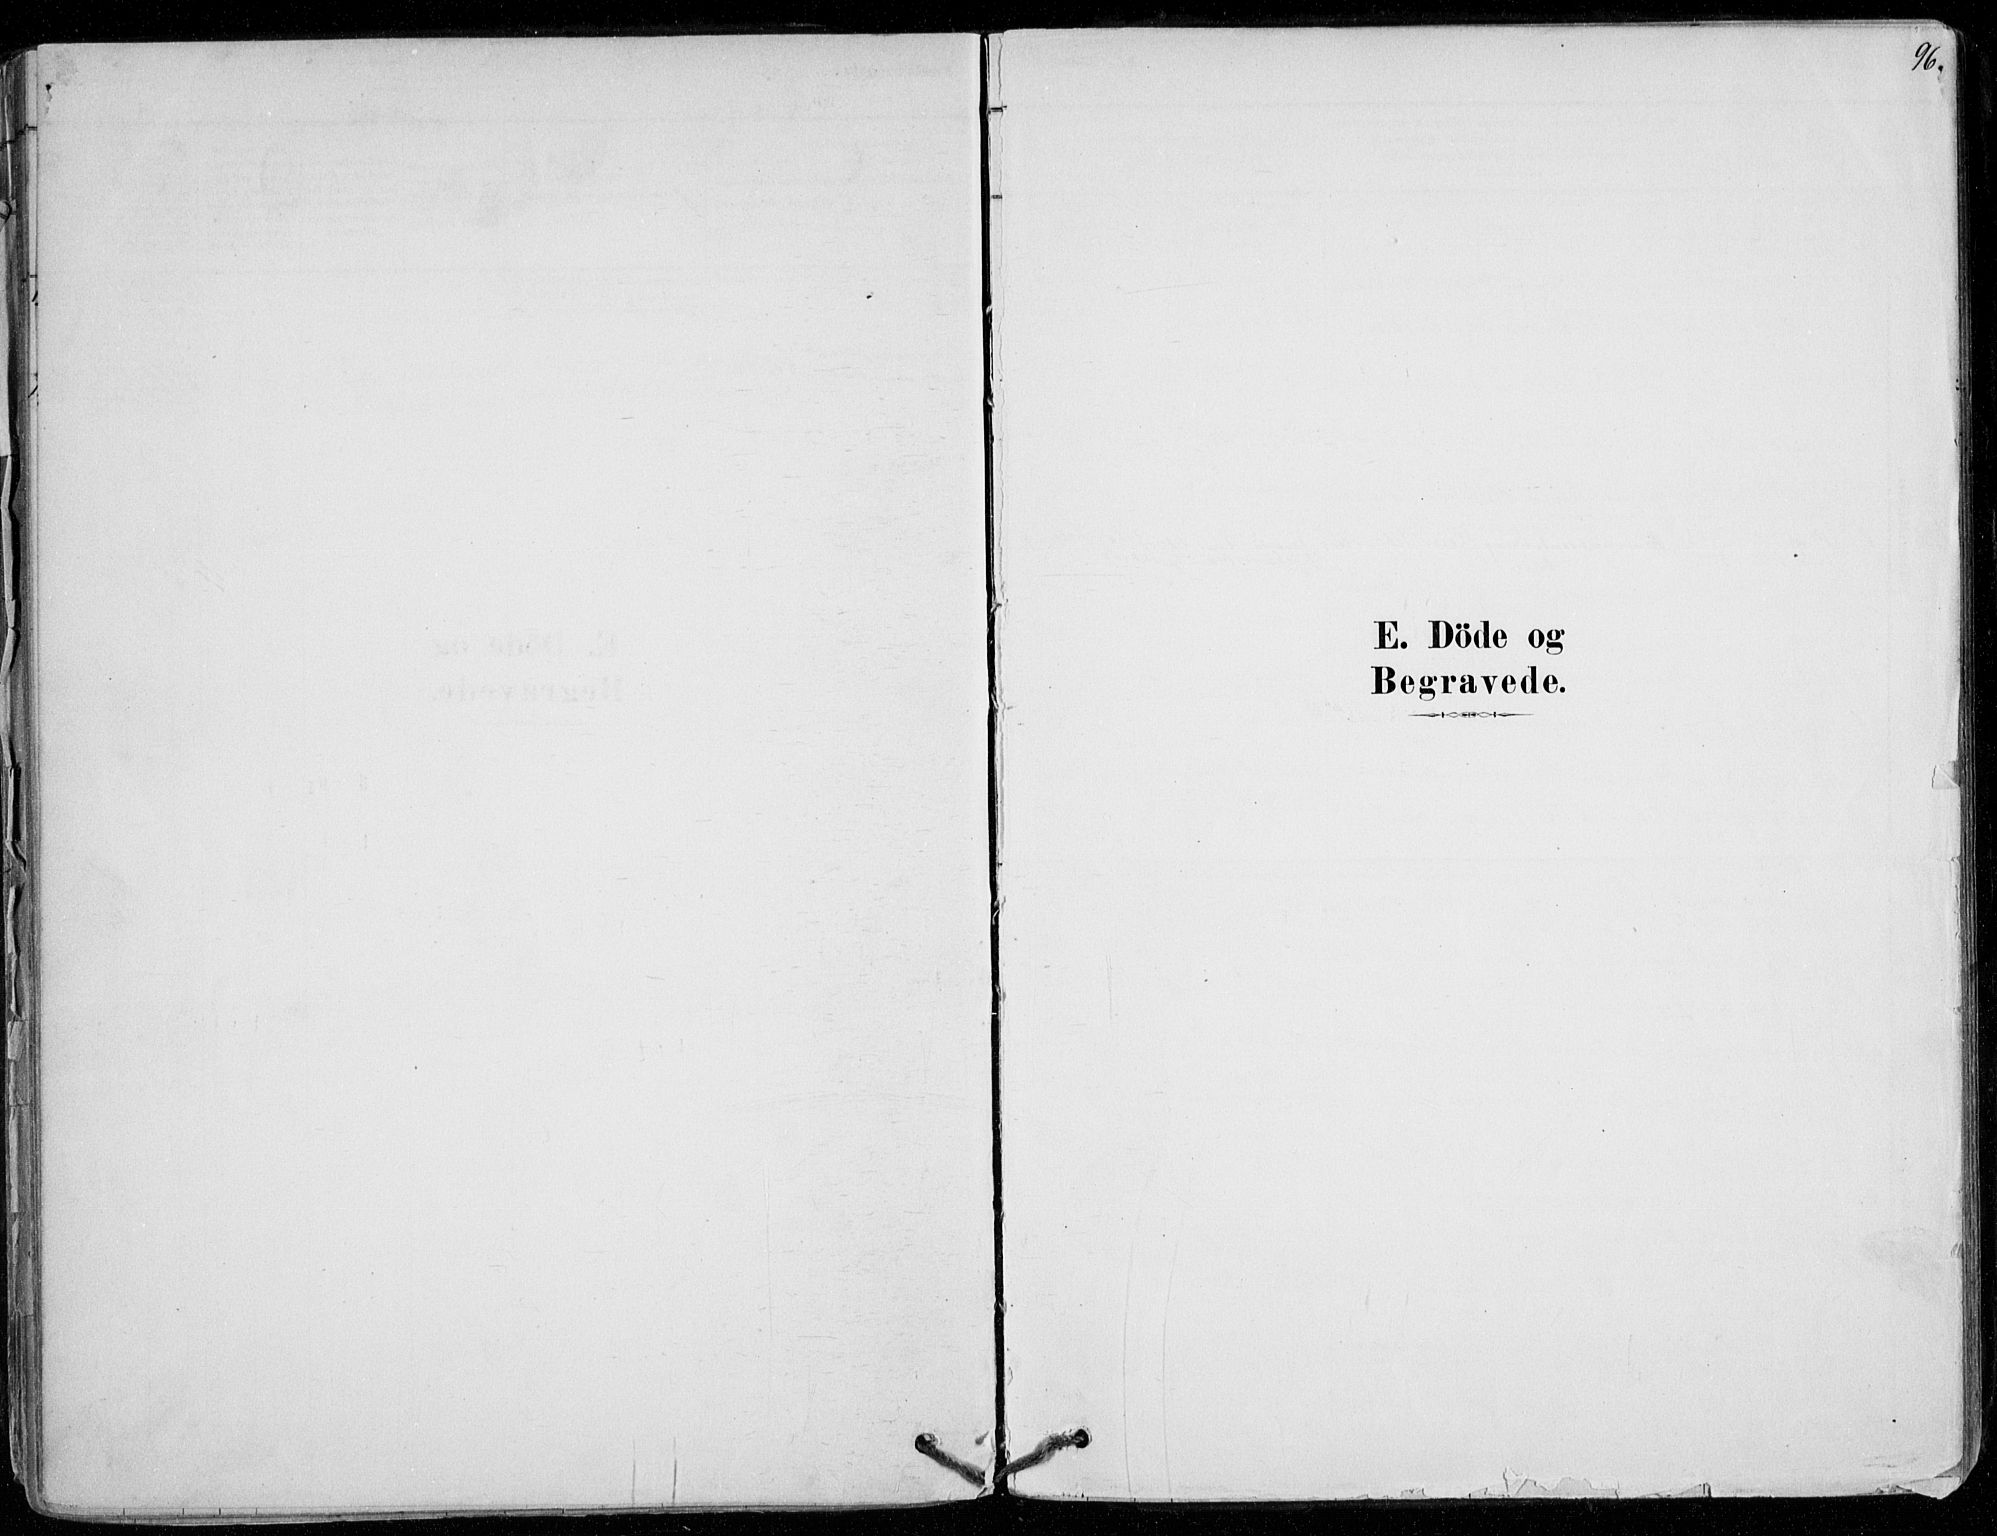 SAO, Vestby prestekontor Kirkebøker, F/Fd/L0001: Parish register (official) no. IV 1, 1878-1945, p. 96